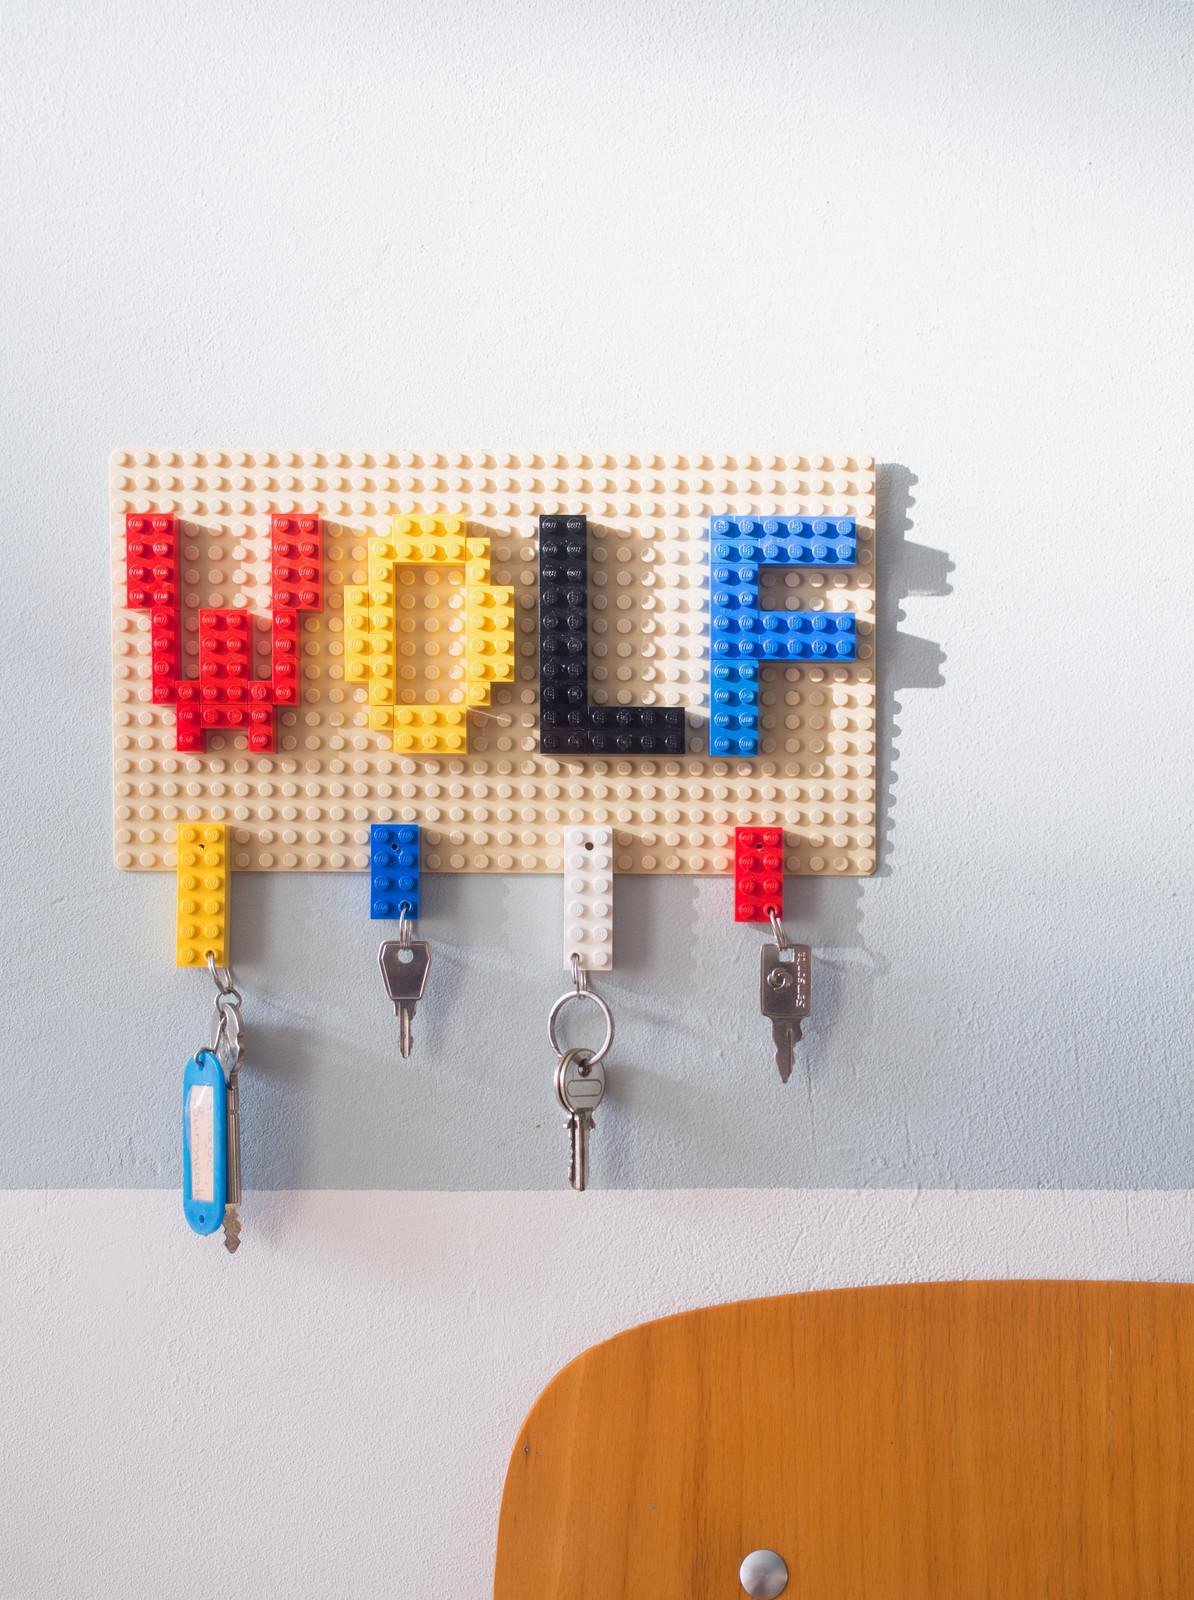 diy schlüsselbrett aus lego